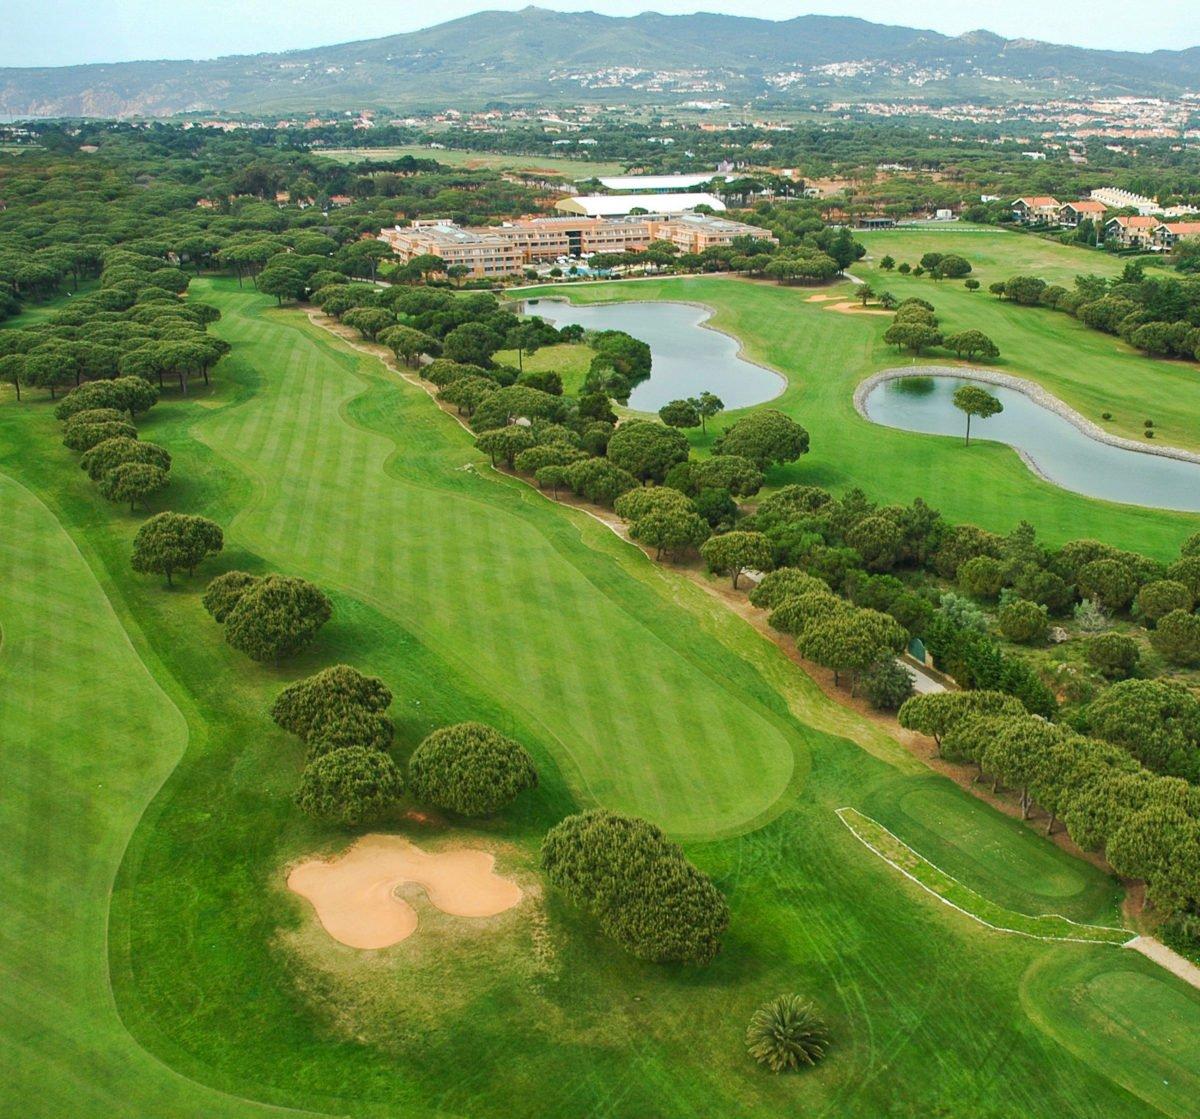 golfbutikken golfreiser quinta da marinha golf resort lisboa